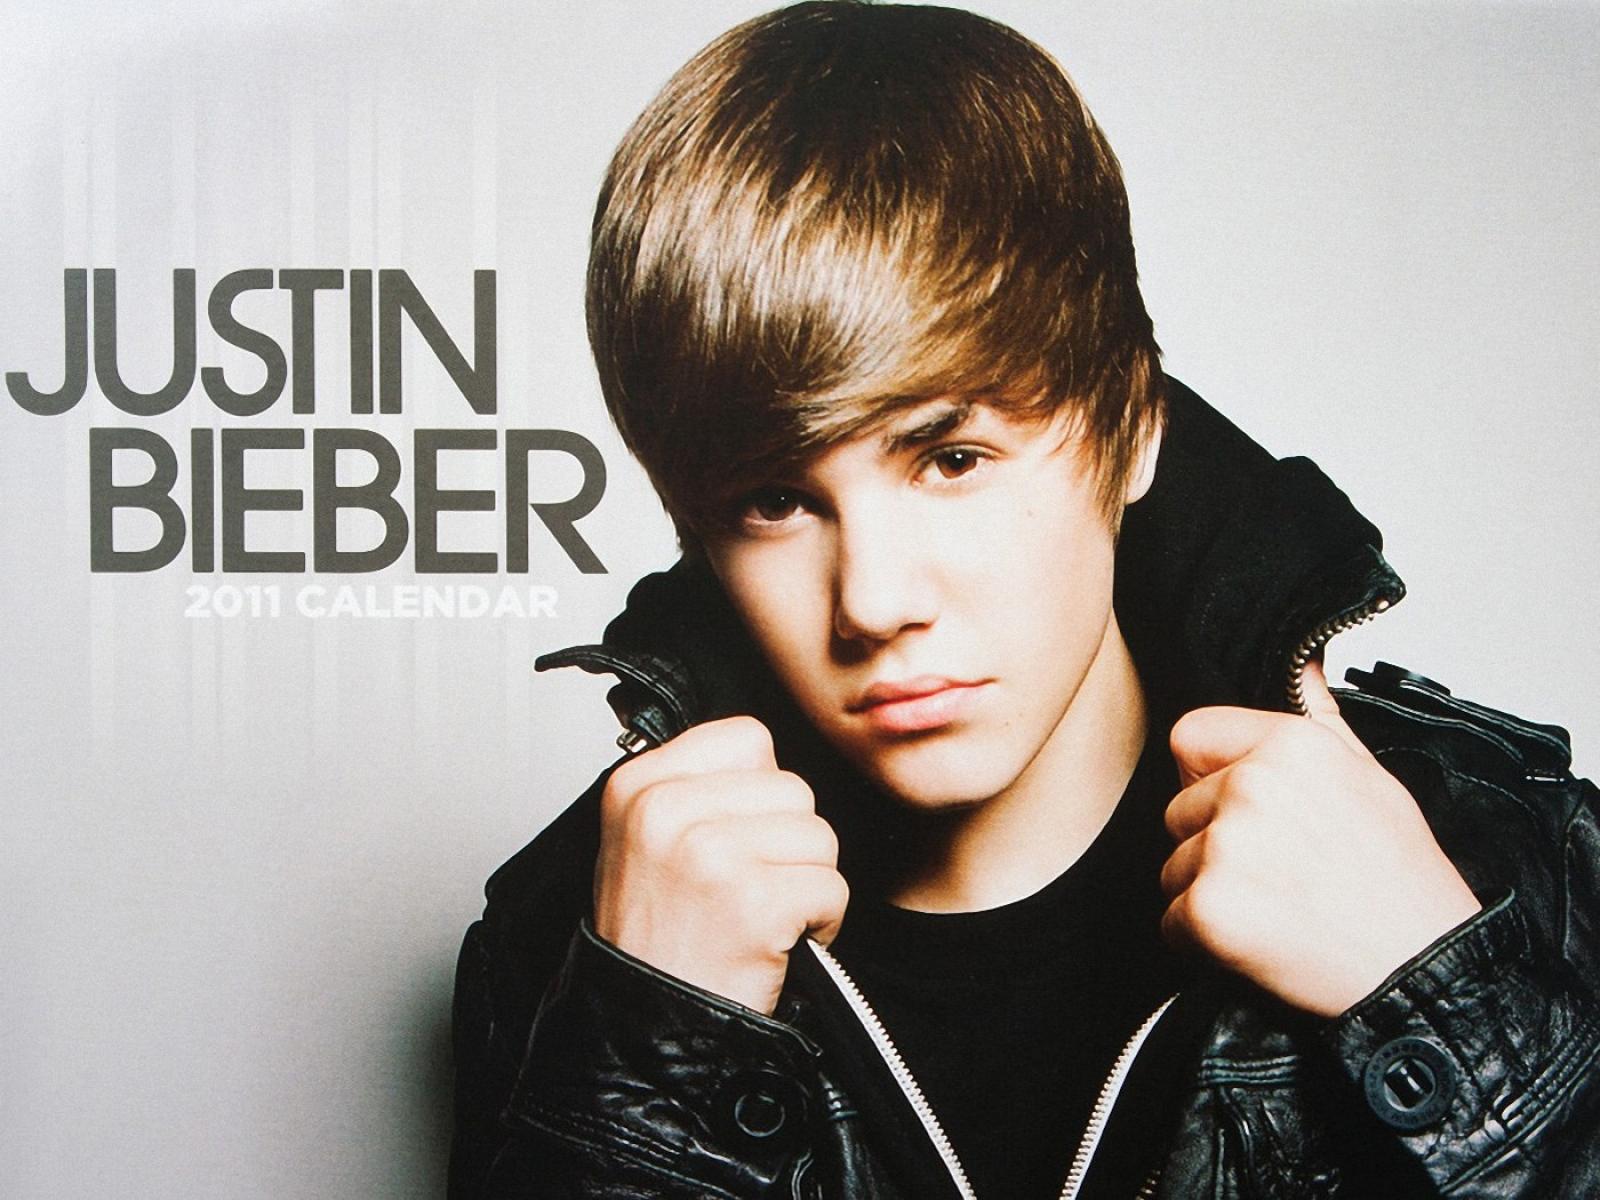 Justin Bieber wallpapers cool